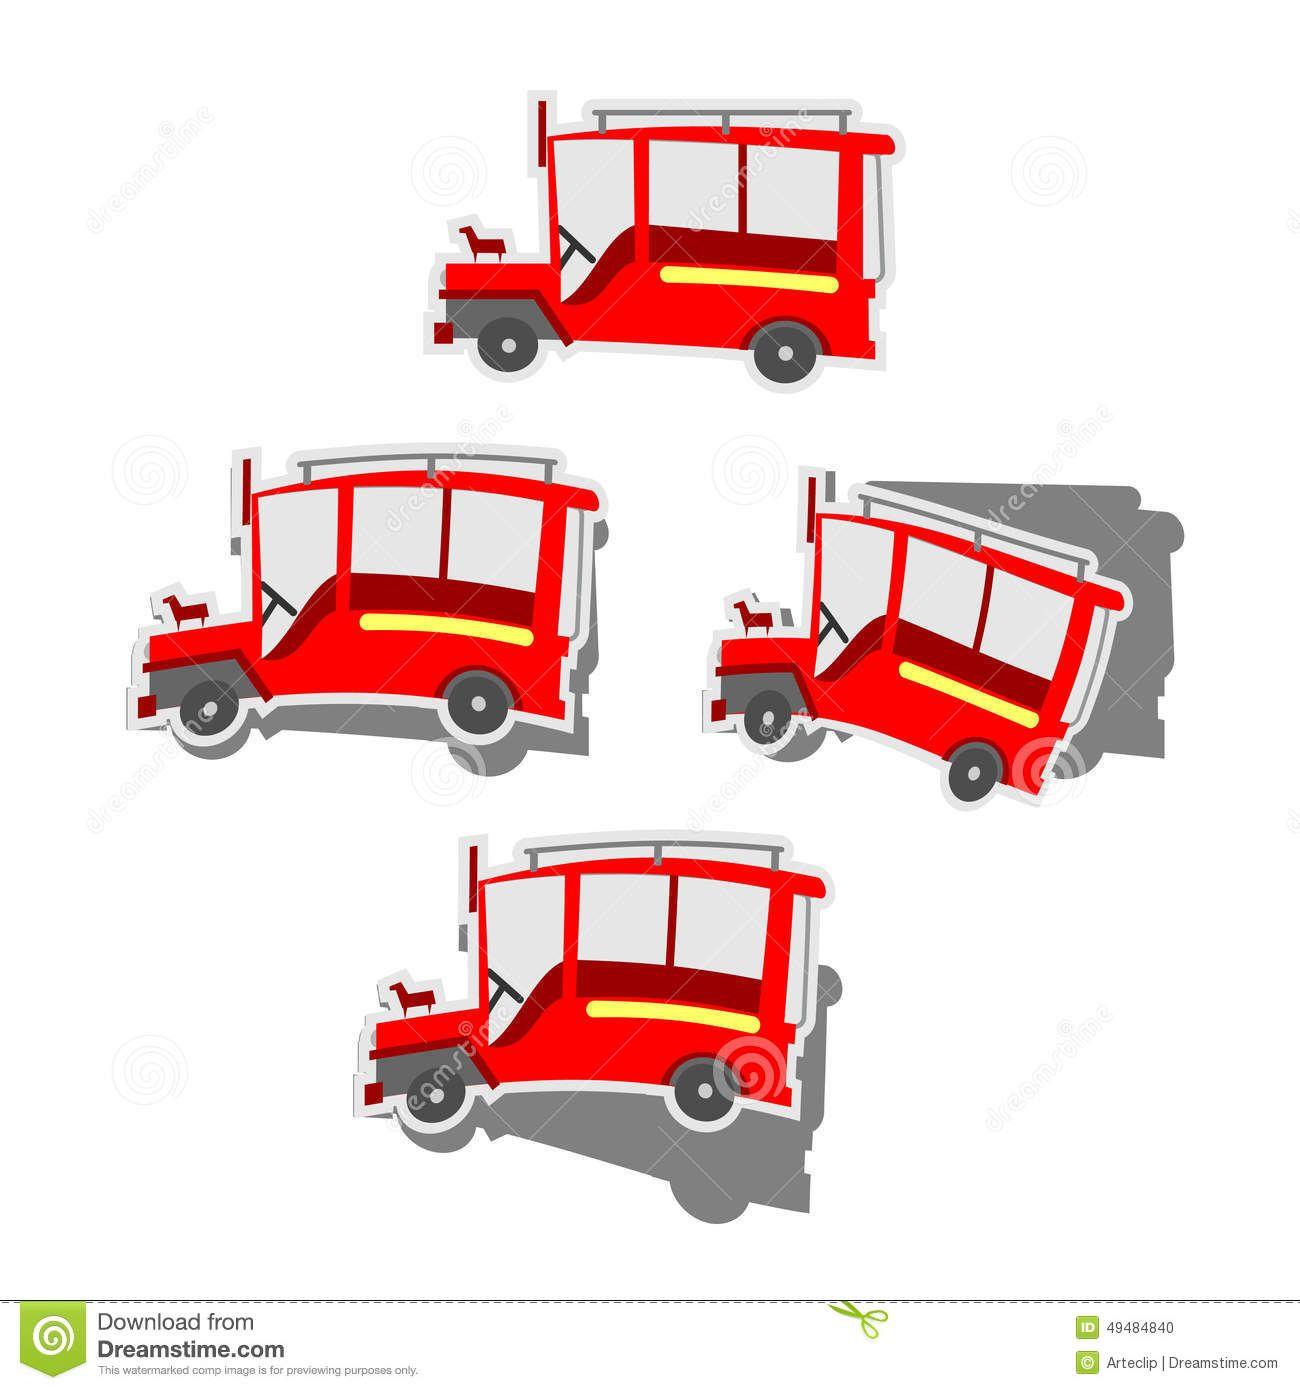 Philippine jeepney sticker set. Jeep clipart pilipino